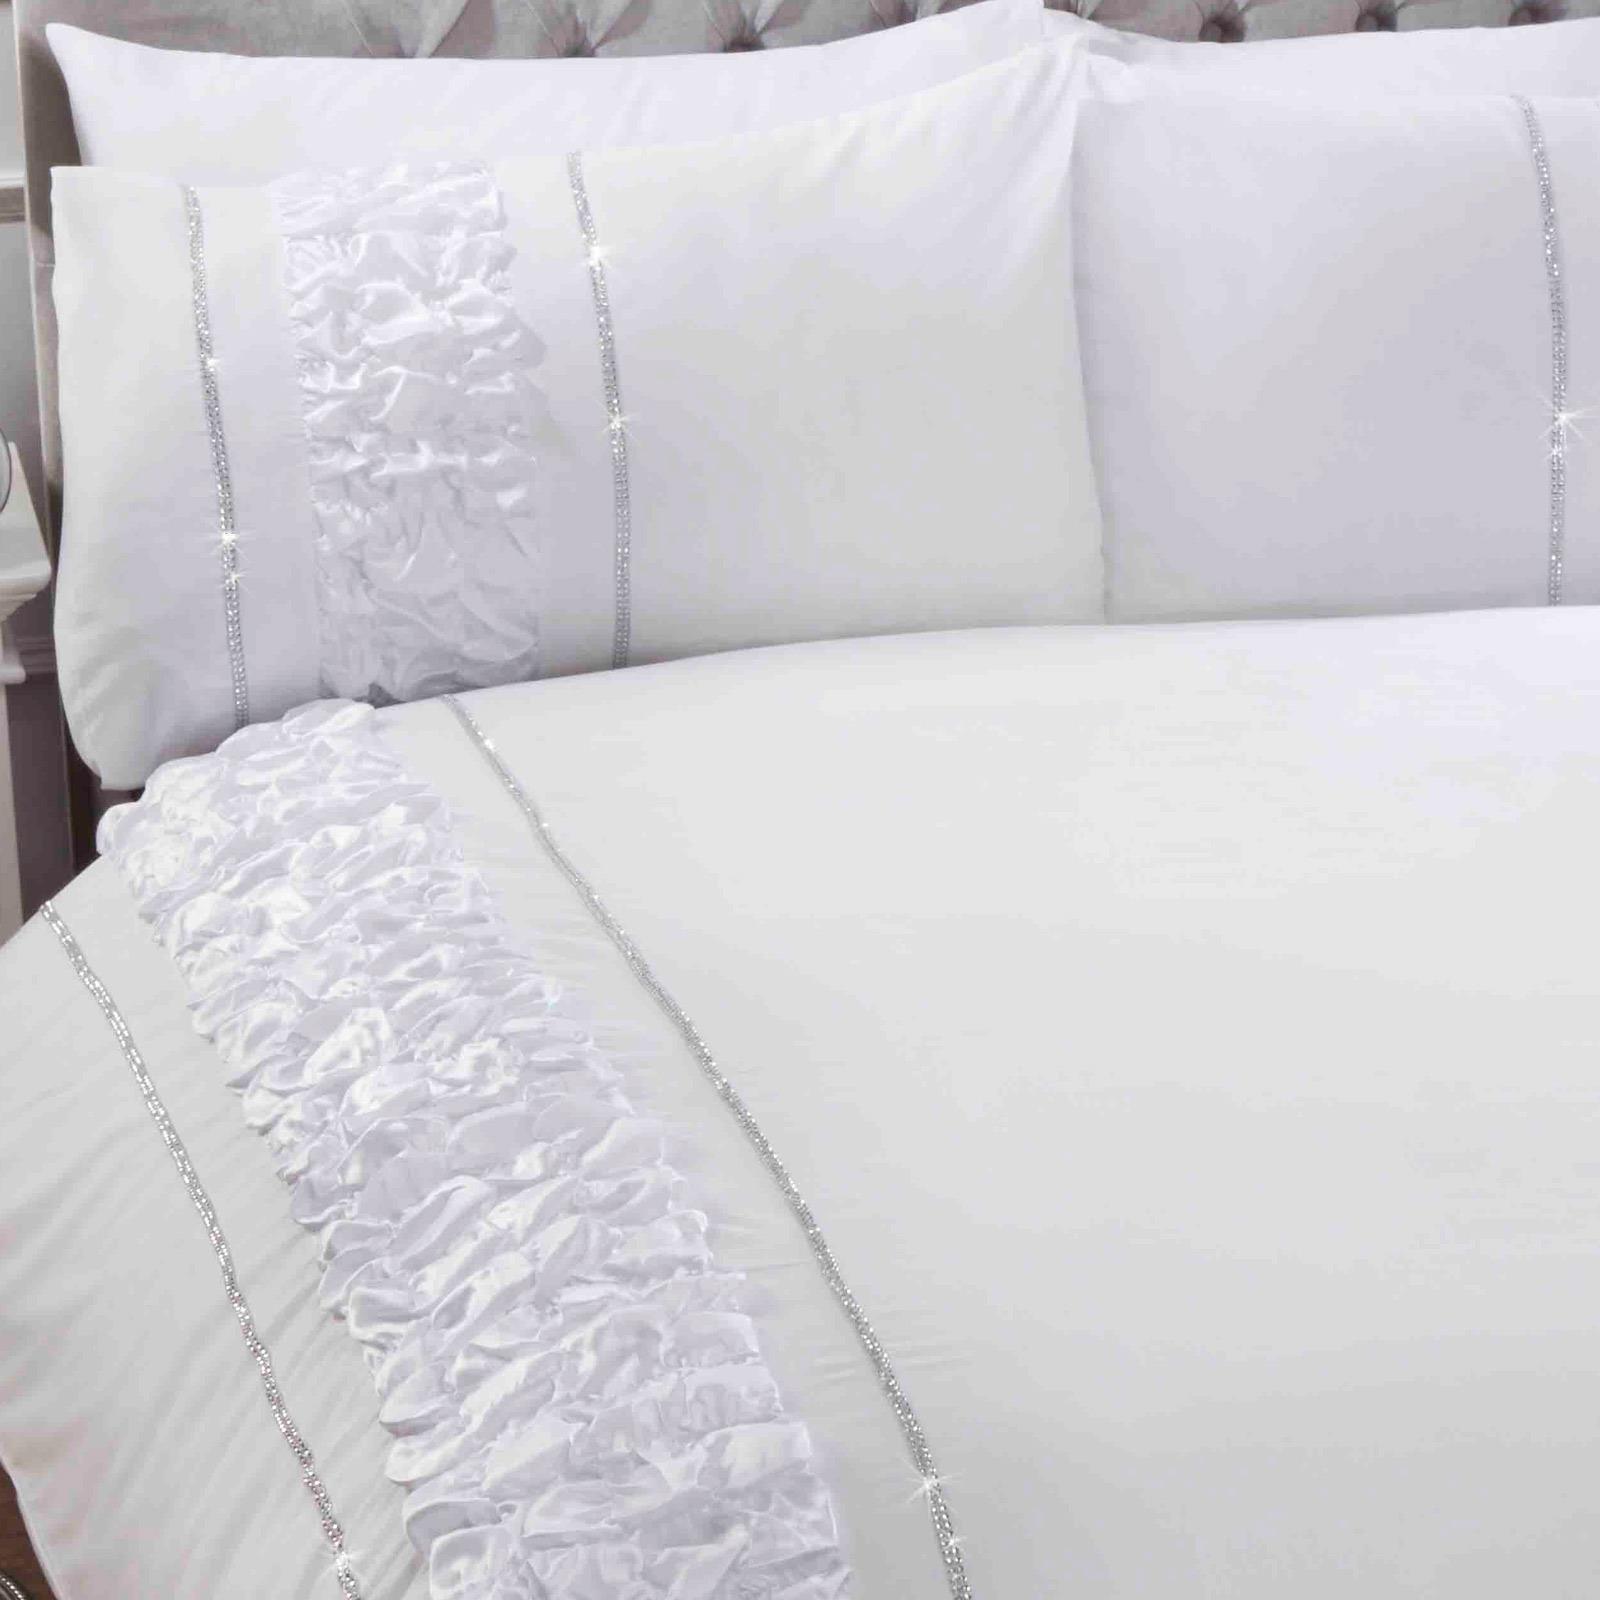 Blanco-Fundas-nordicas-Provence-Sparkle-Bling-Diamante-cubierta-del-edredon-conjuntos-de-cama miniatura 7